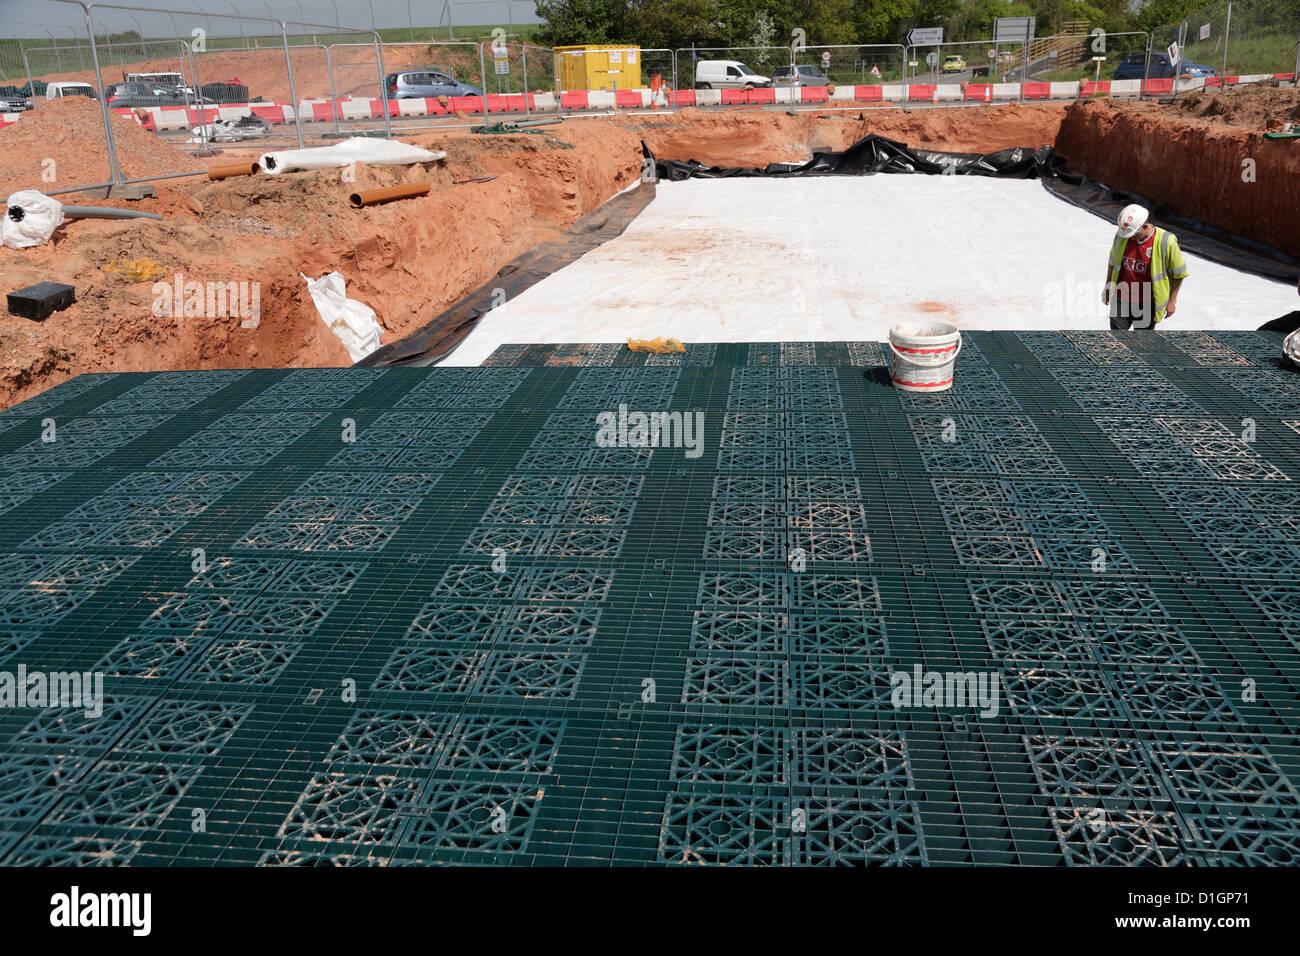 Nachhaltige Stormbloc Kunststoff Kiste Dämpfung Reservoir Entwässerungssystem auf uk neuen Straßenbaustelle Stockbild